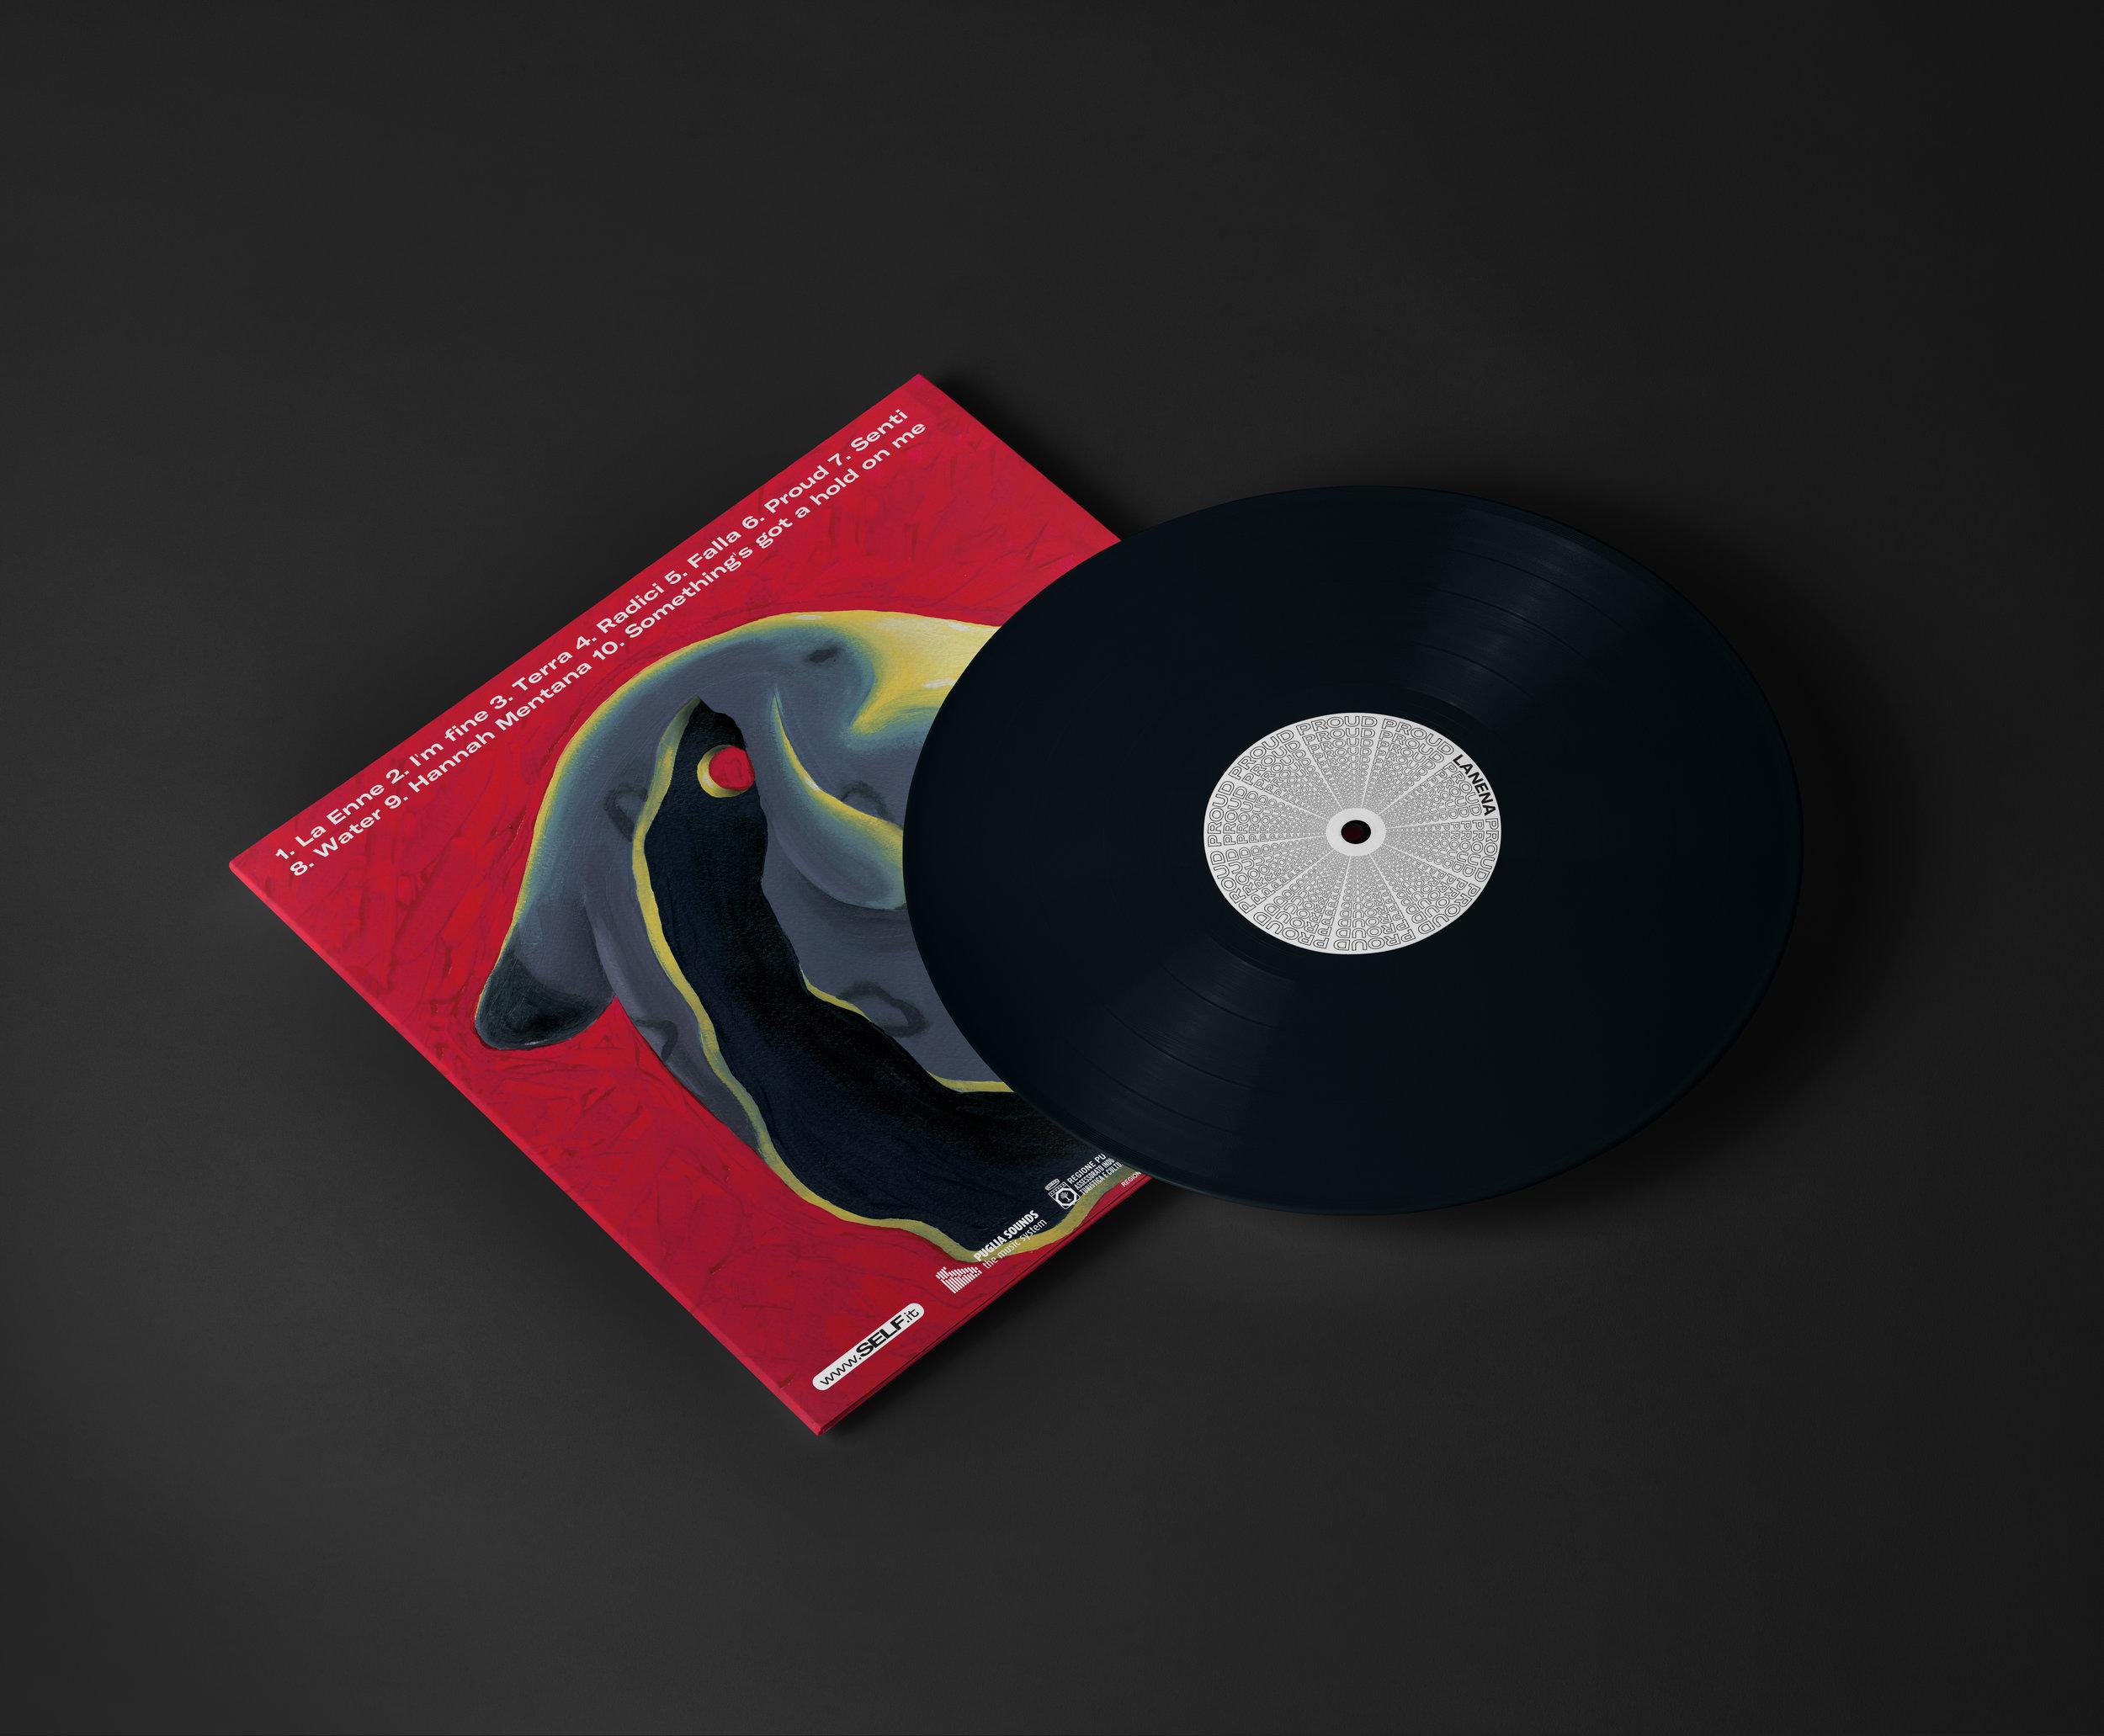 Vinyl-Record-Disc-Mockup.jpg